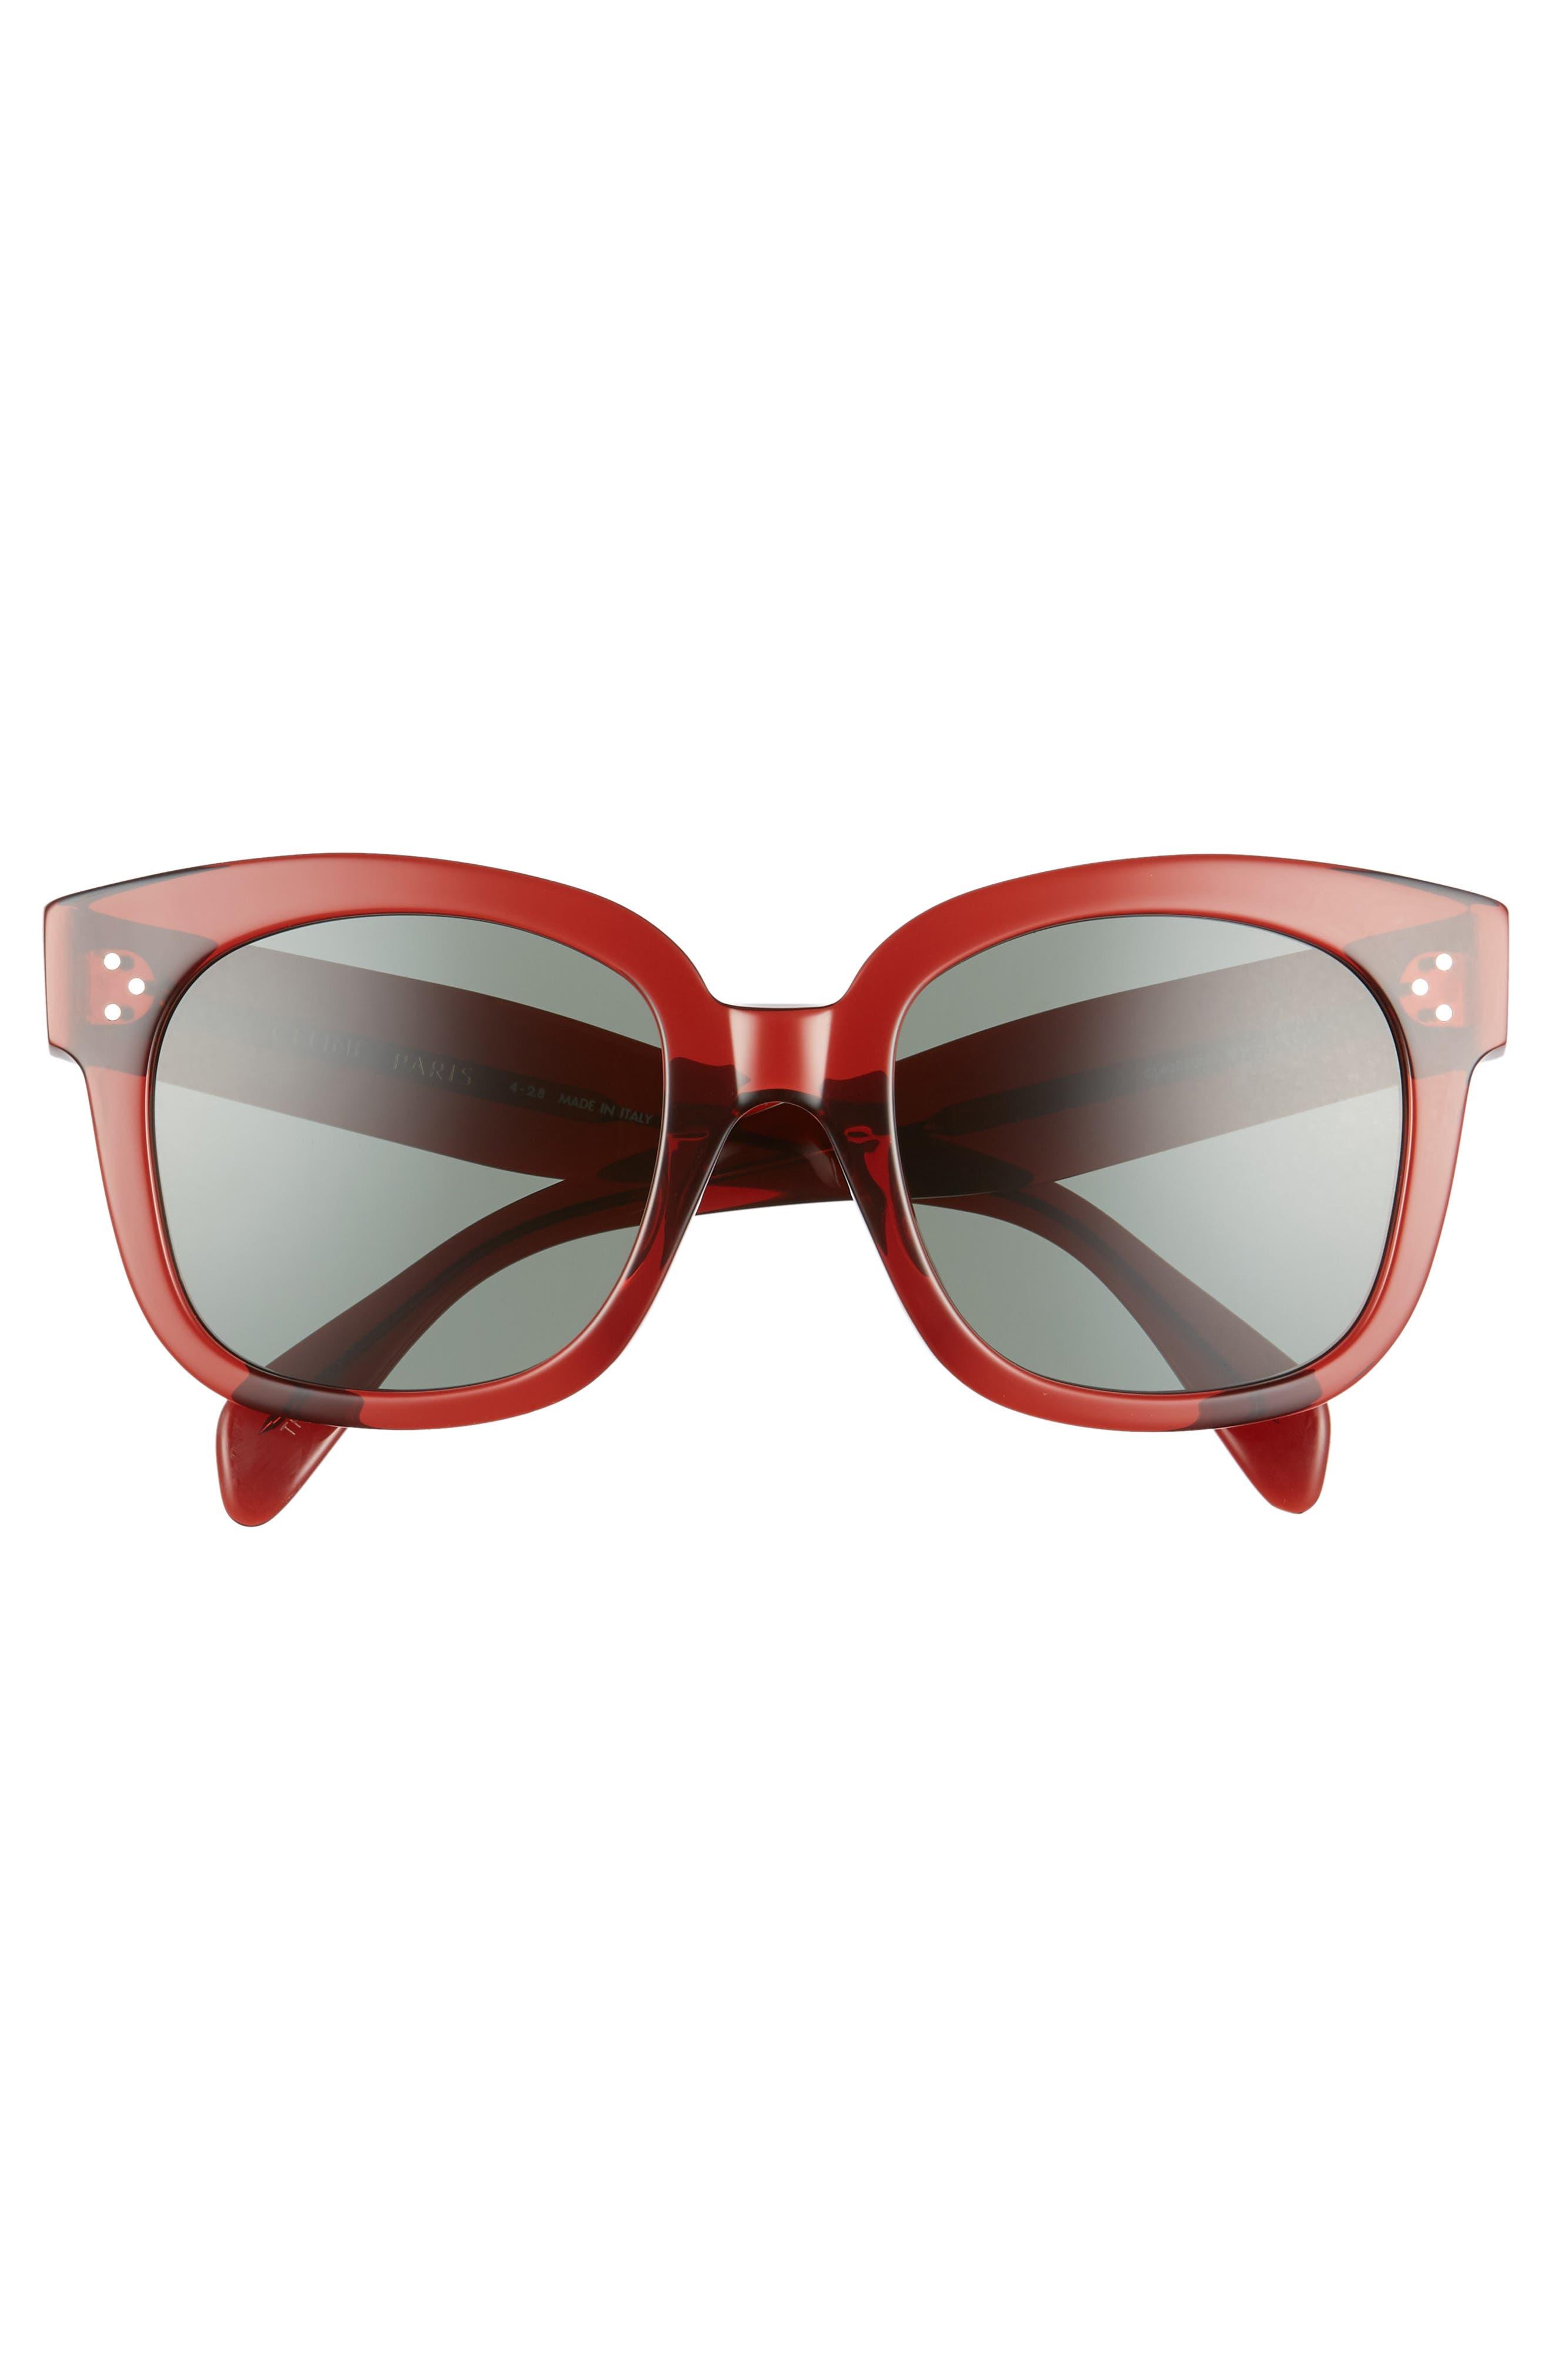 54mm Round Sunglasses,                             Alternate thumbnail 3, color,                             BORDEAUX/ GREEN